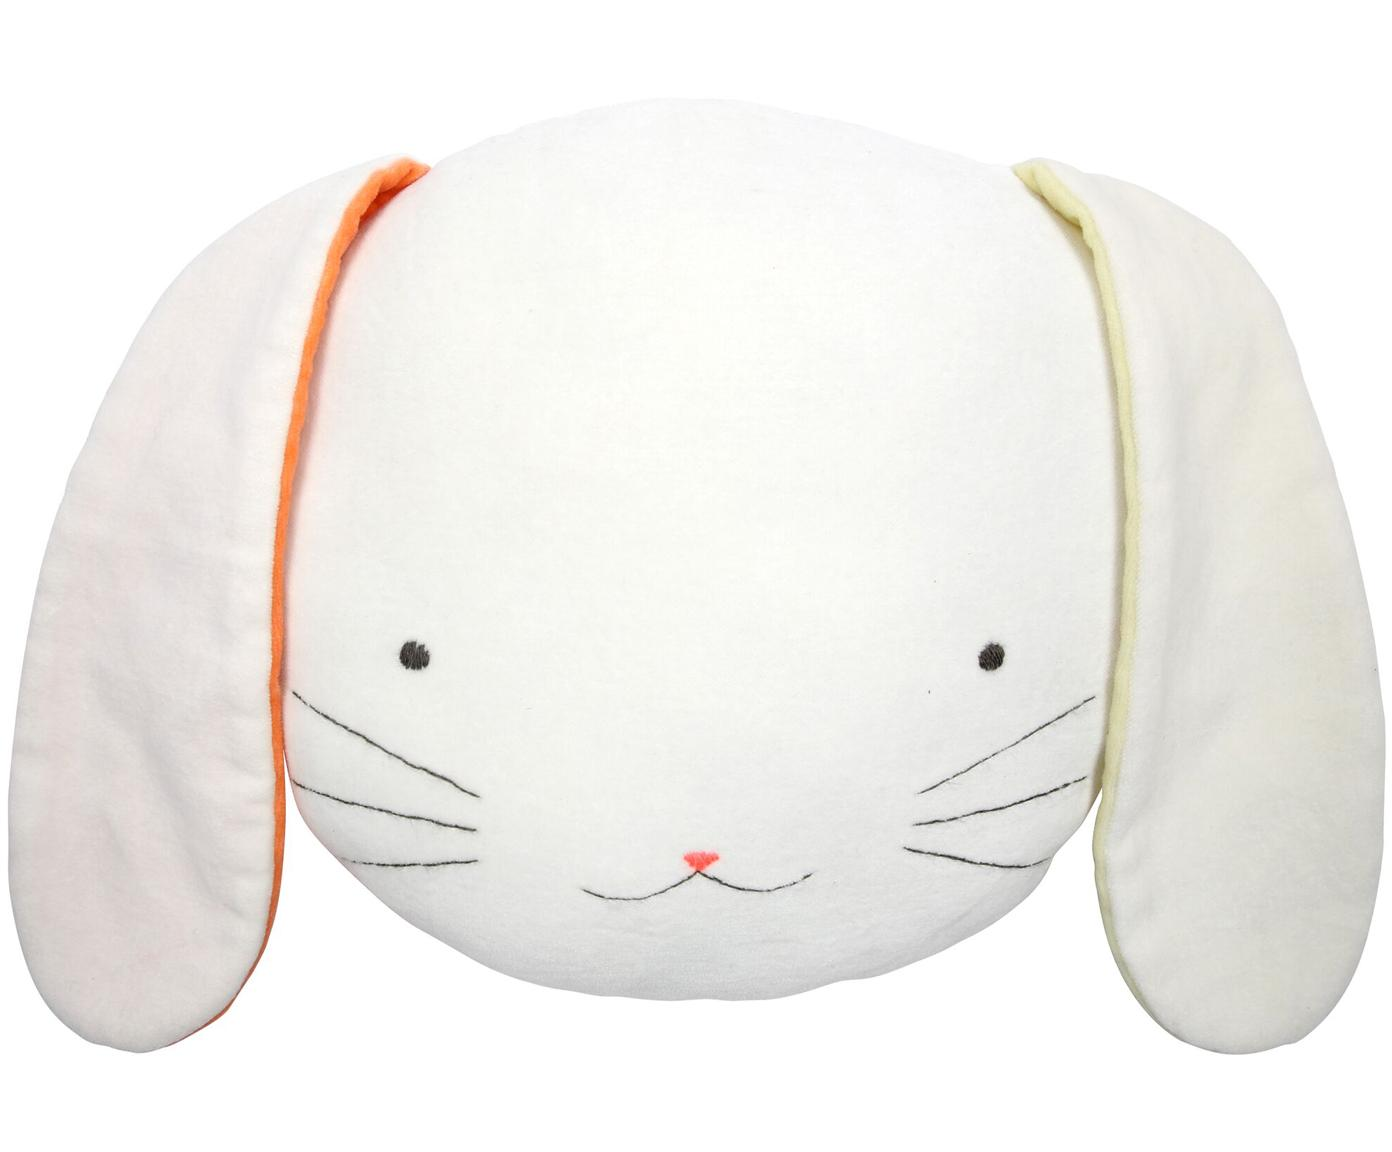 Cojín peluche Bunny, Funda: terciopelo de algodón, Blanco, amarillo, naranja, negro, An 26 x Al 20 cm